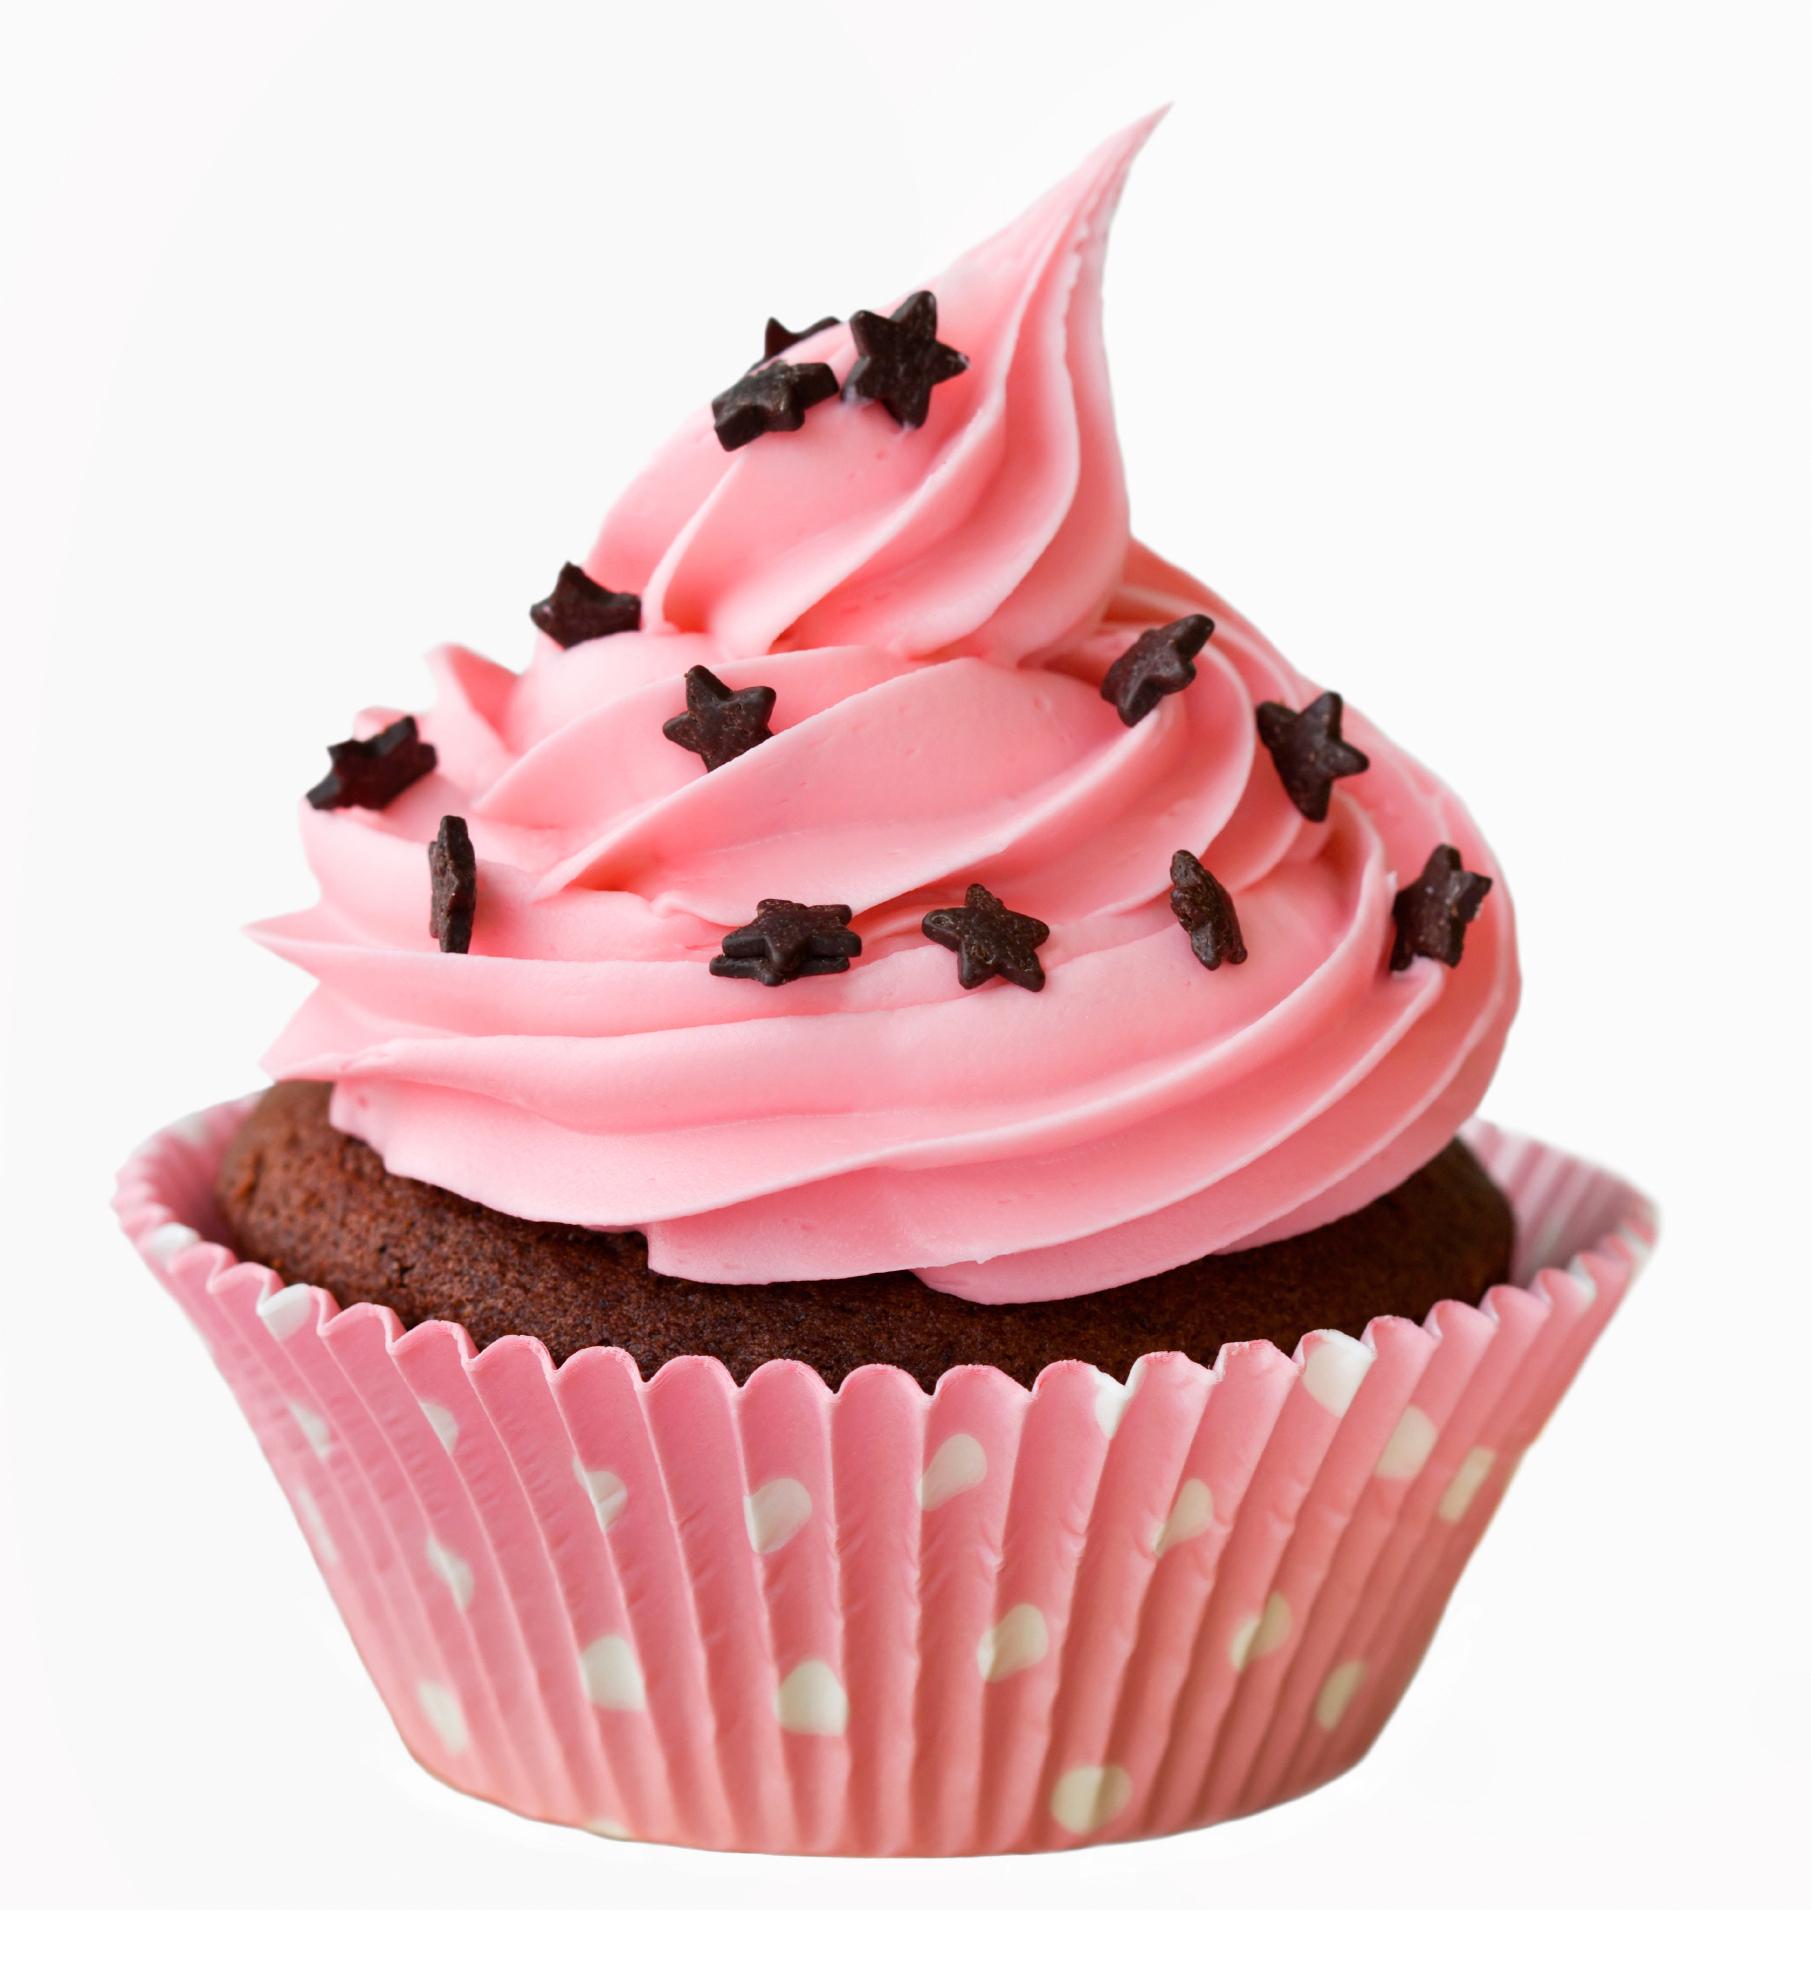 Coloriage Cupcake À Imprimer avec Coloriage Cupcake A Imprimer